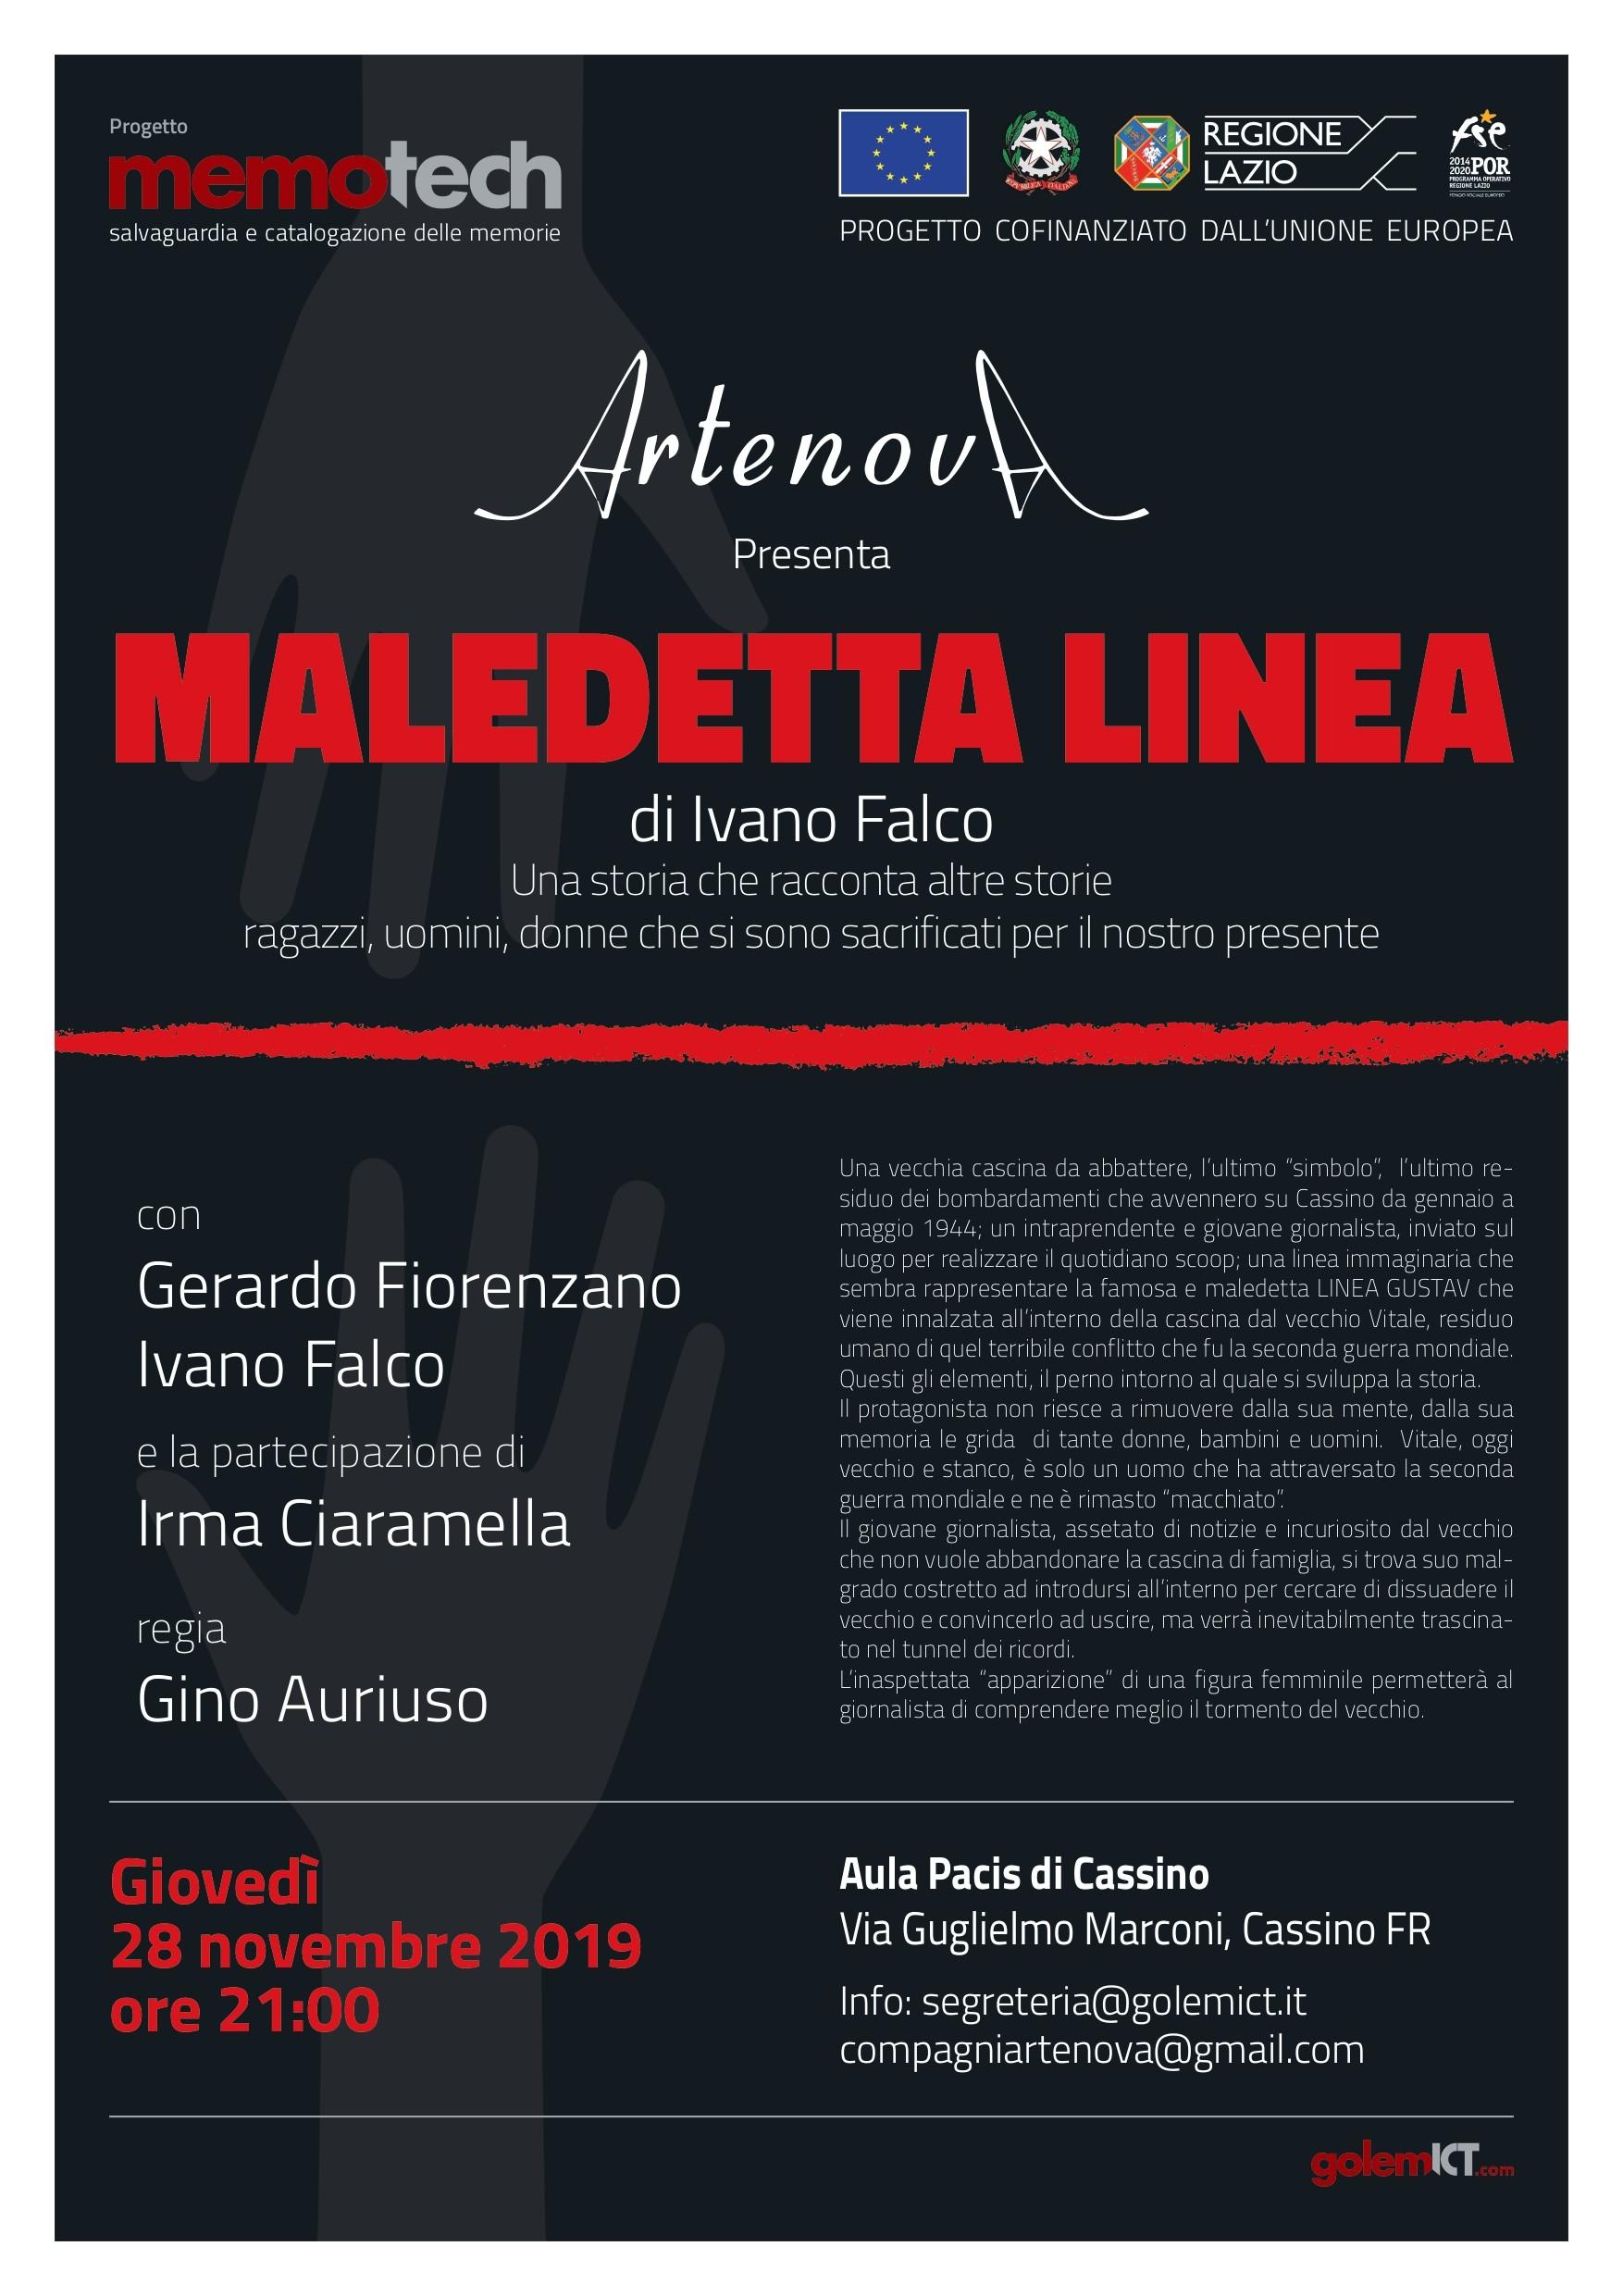 meledetta-linea-cassino-locandina